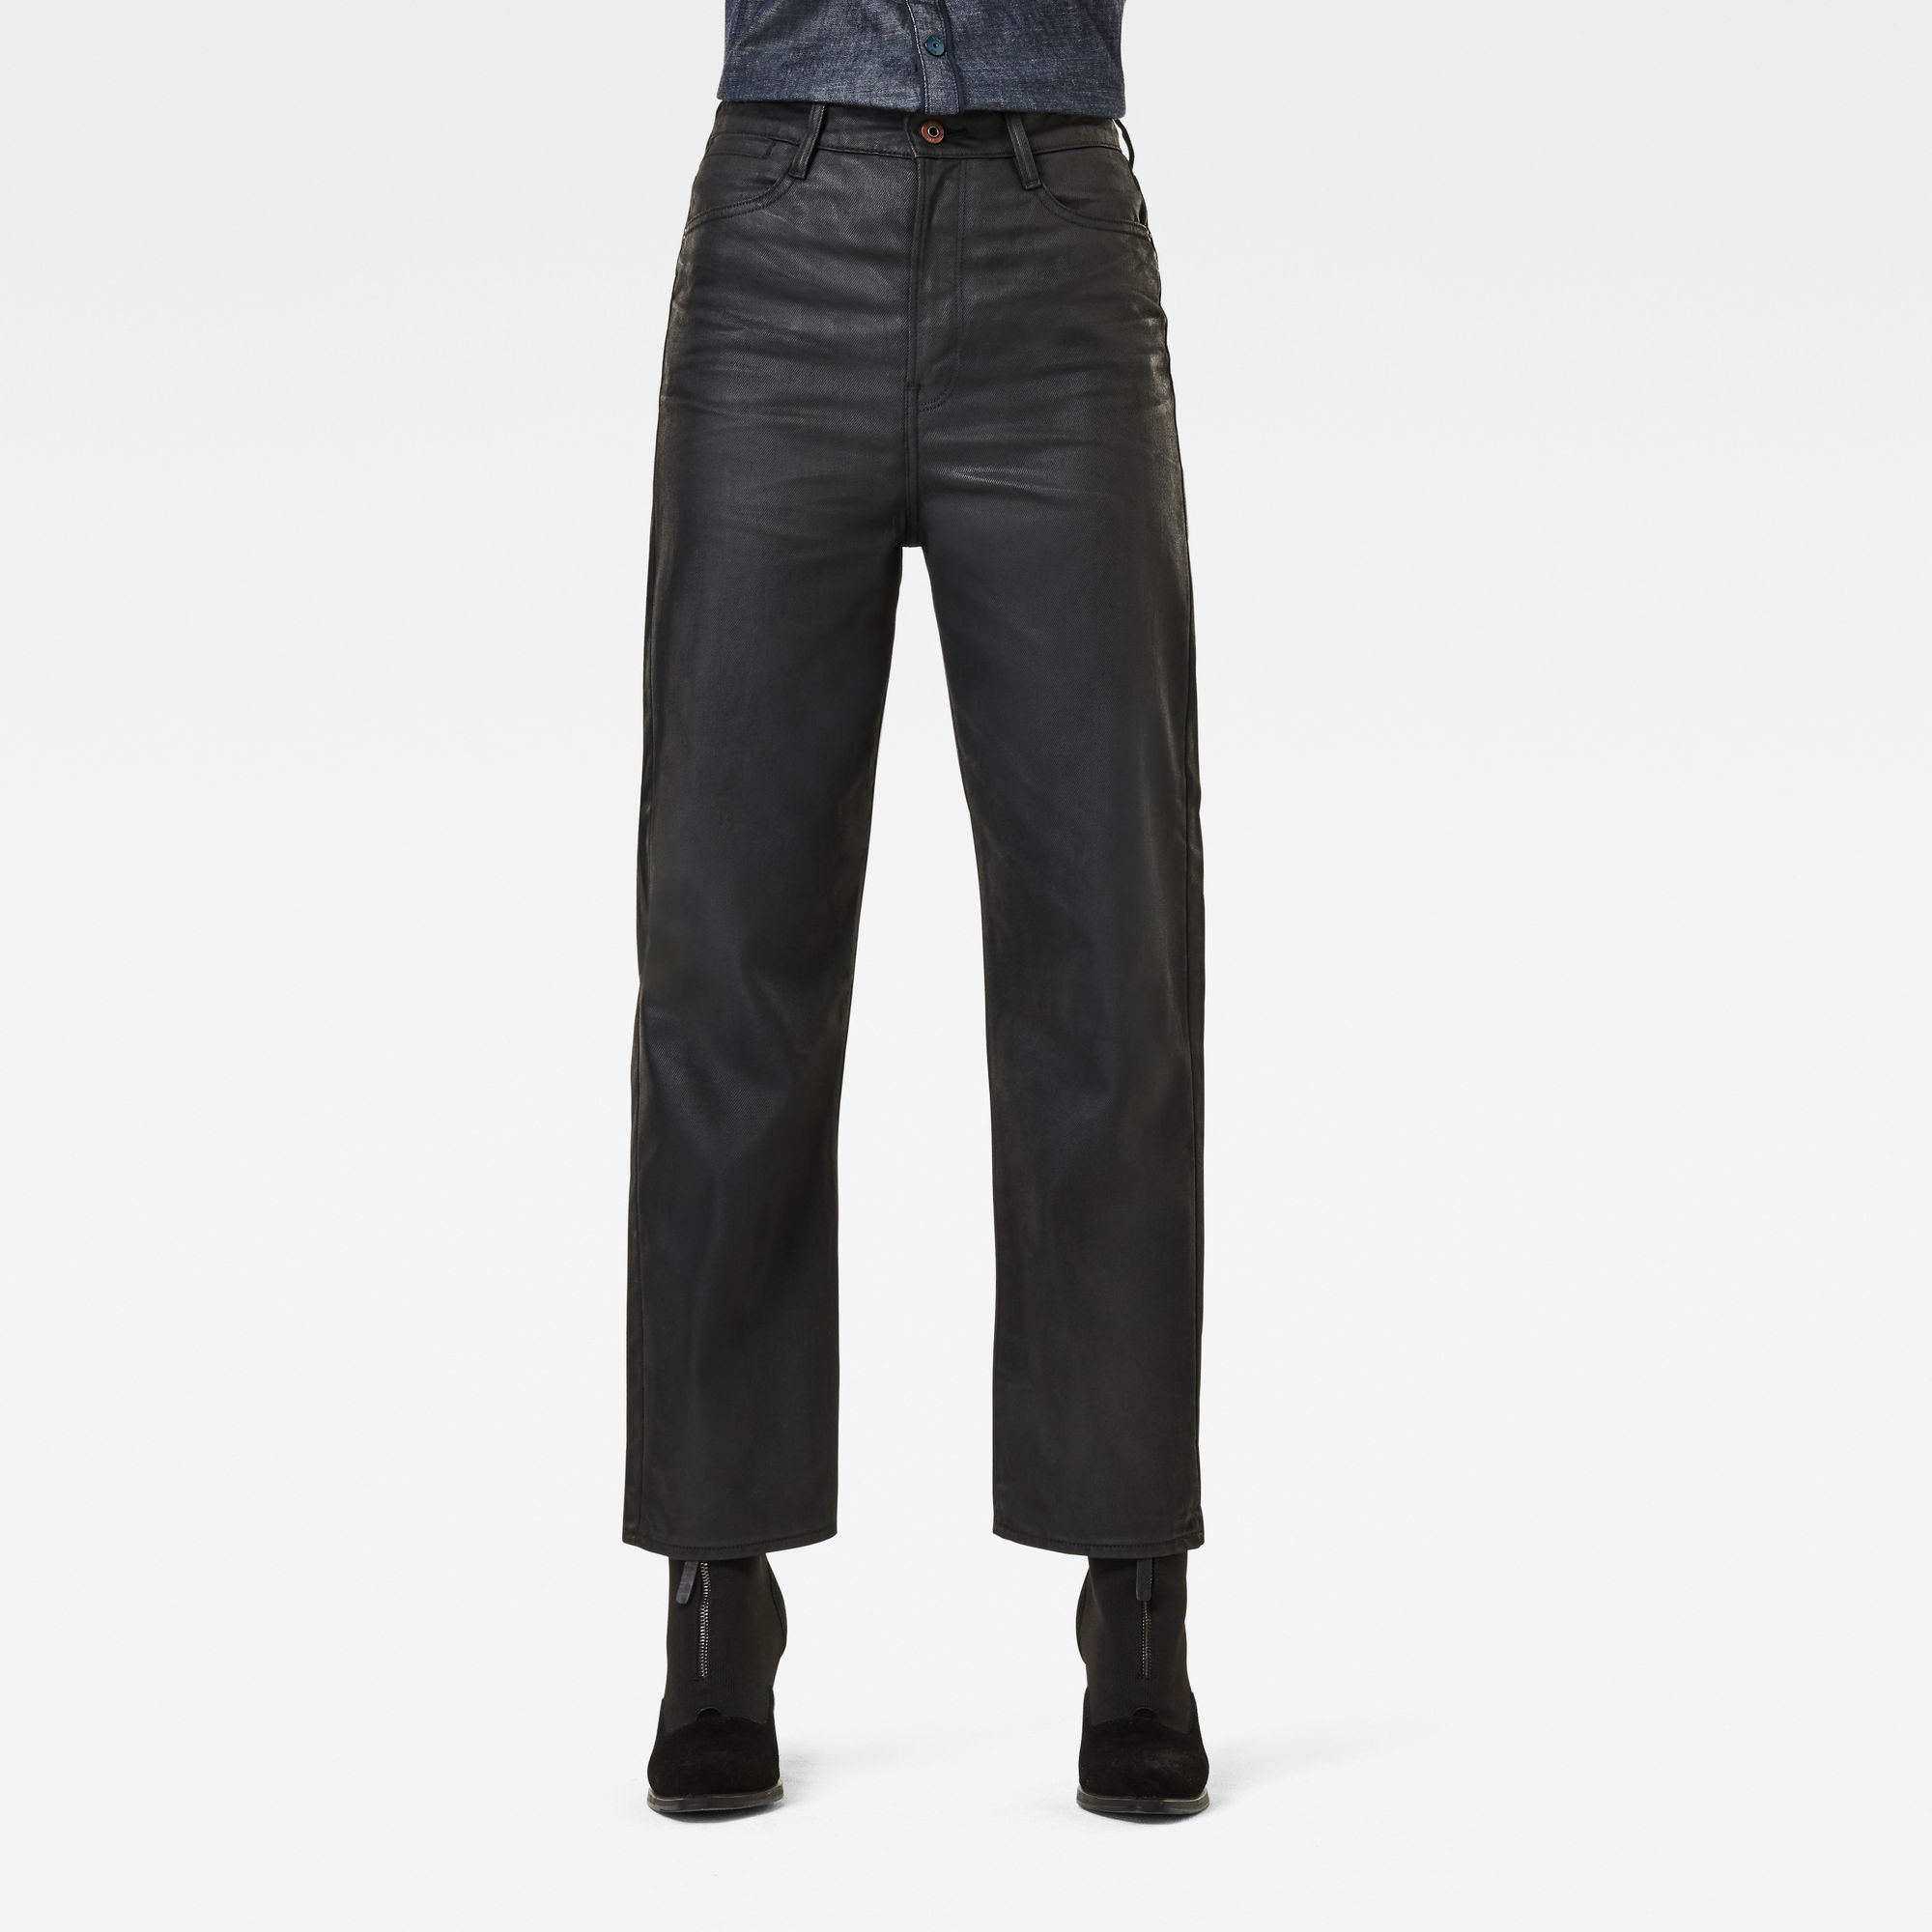 G-Star RAW Dames Tedie Ultra High Straight Ankle Jeans Zwart